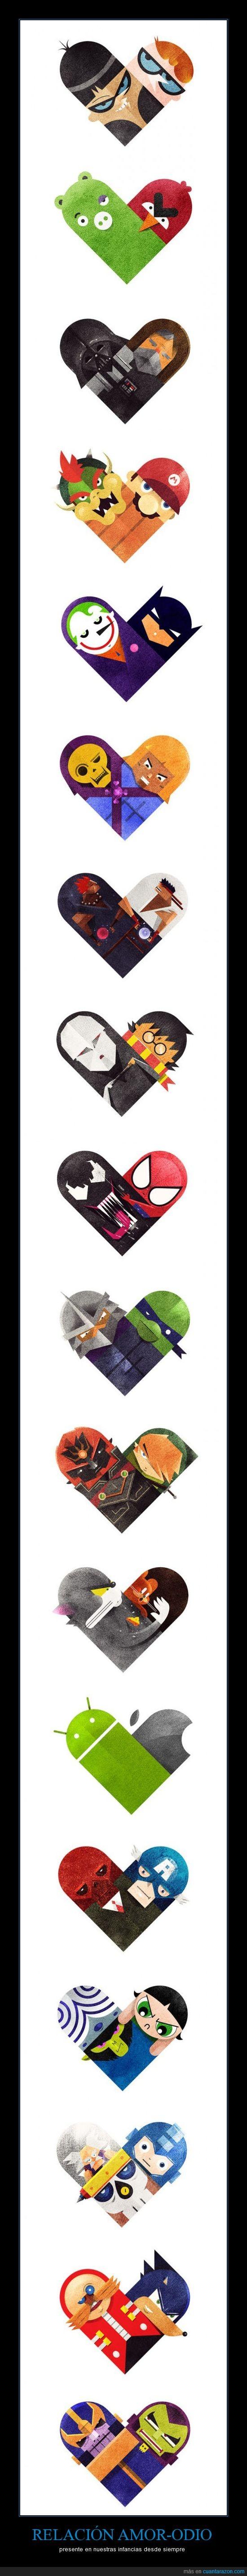 amor,android,apple,bellota,chicas,dexter,jerry,mojo jojo,ninjas,odio,sonic,superpoderosas,tom,tortugas